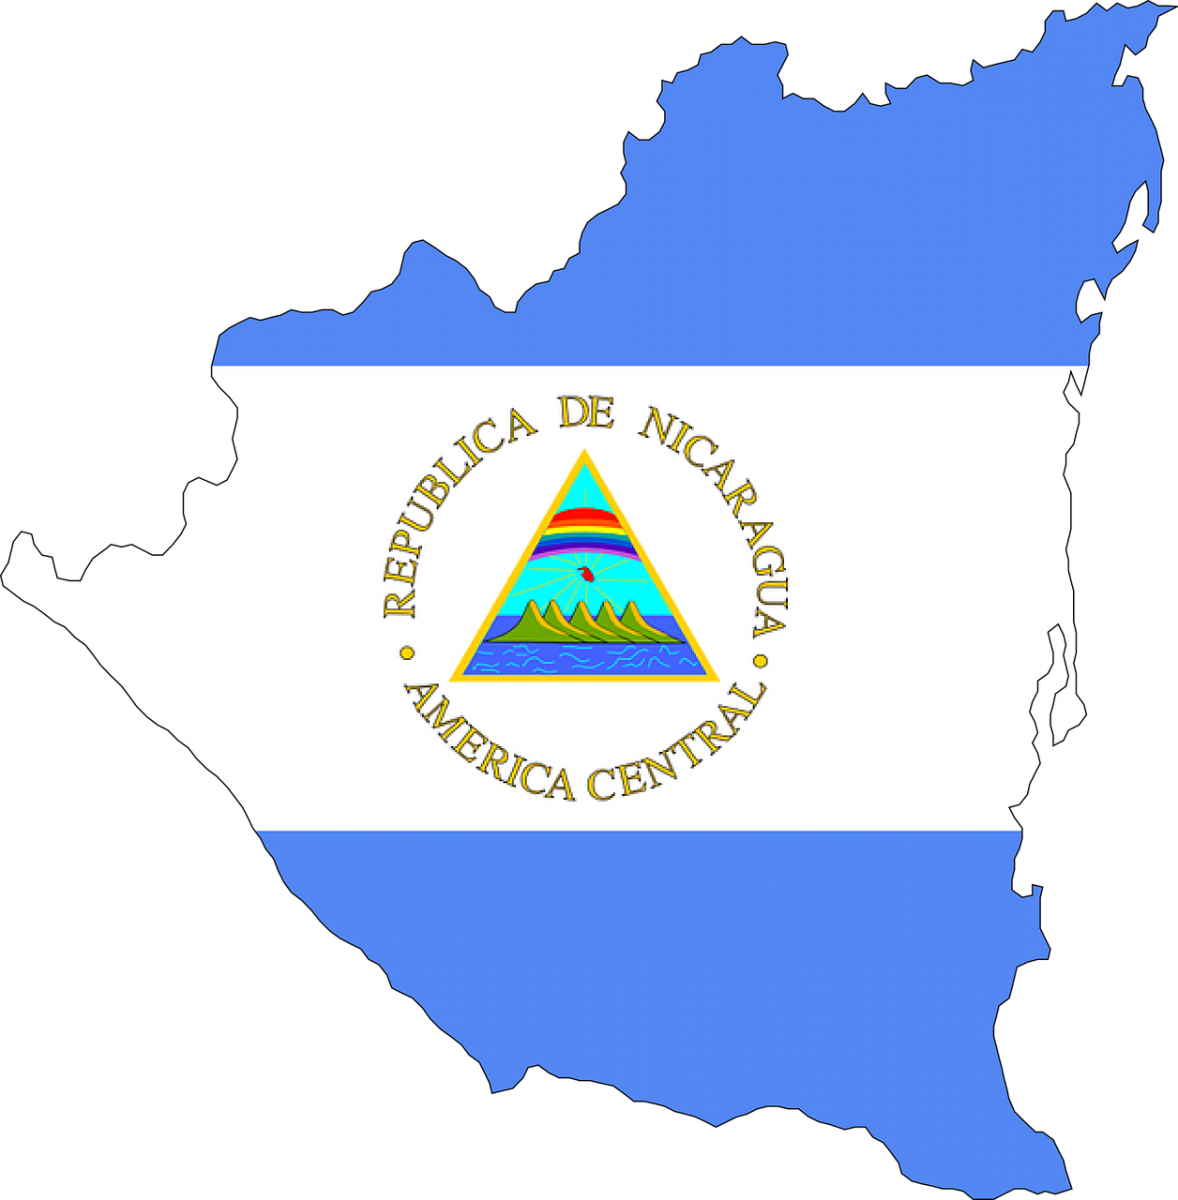 https://www.toledo.es/wp-content/uploads/2018/05/nicaragua-890668_1280-1178x1200.png. Nicaragua debe investigar las muertes ocurridas durante las protestas